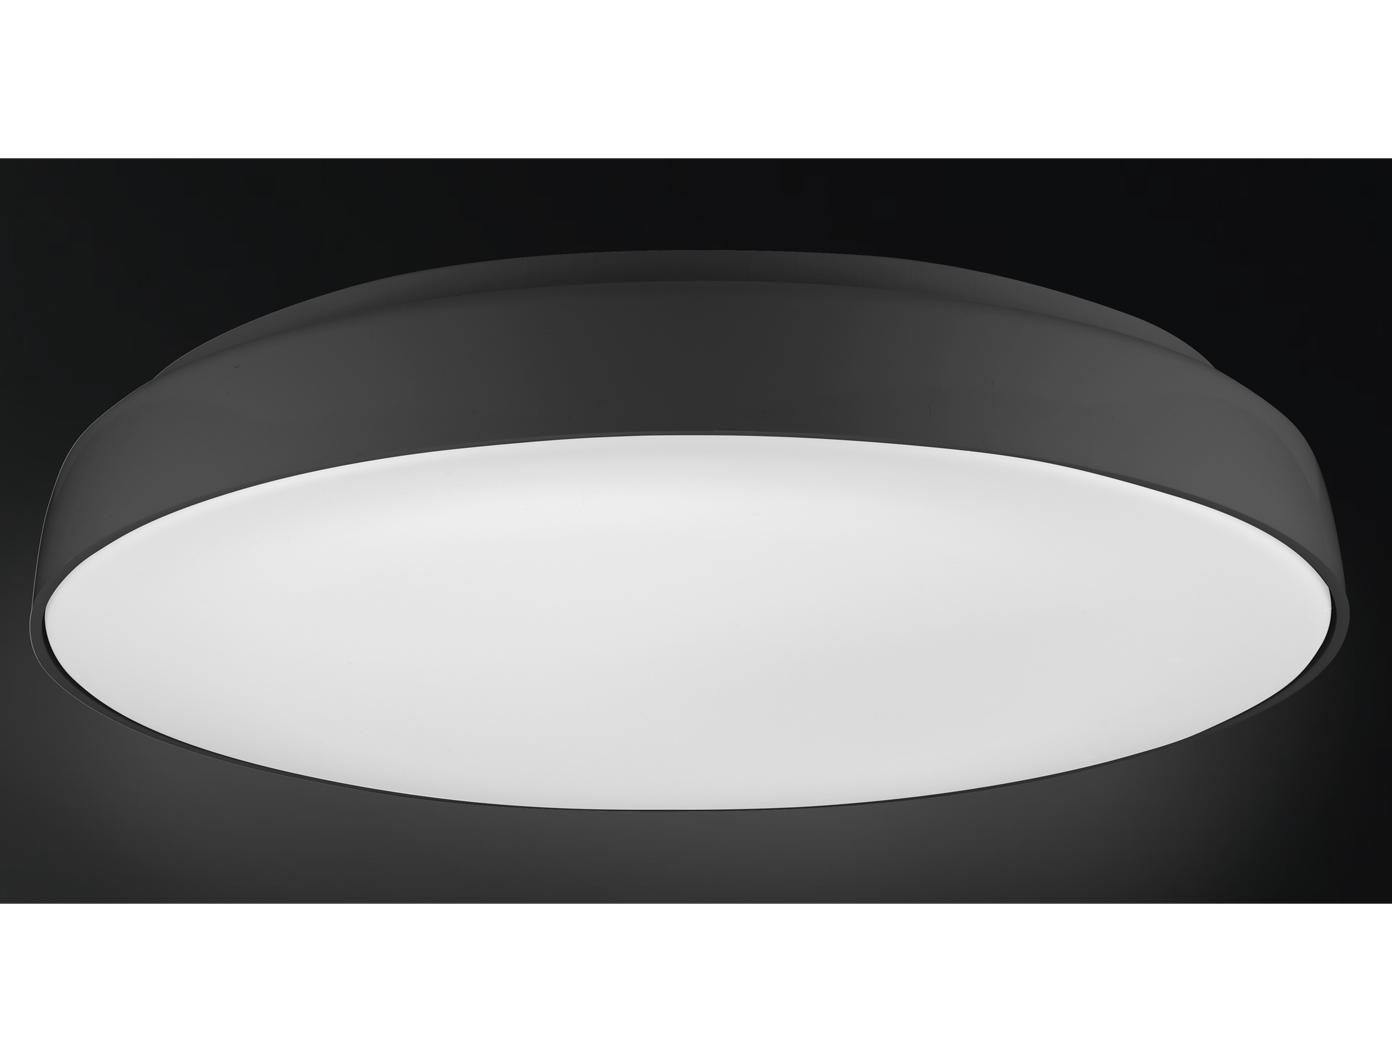 Full Size of Schlafzimmer Deckenlampe Deckenlampen Obi Deckenleuchte Led Modern Design Ultraslim Dimmbar Wohnzimmer Ip44 Ideen 5d8d455fc5122 Kommode Set Weiß Nolte Schlafzimmer Schlafzimmer Deckenlampe